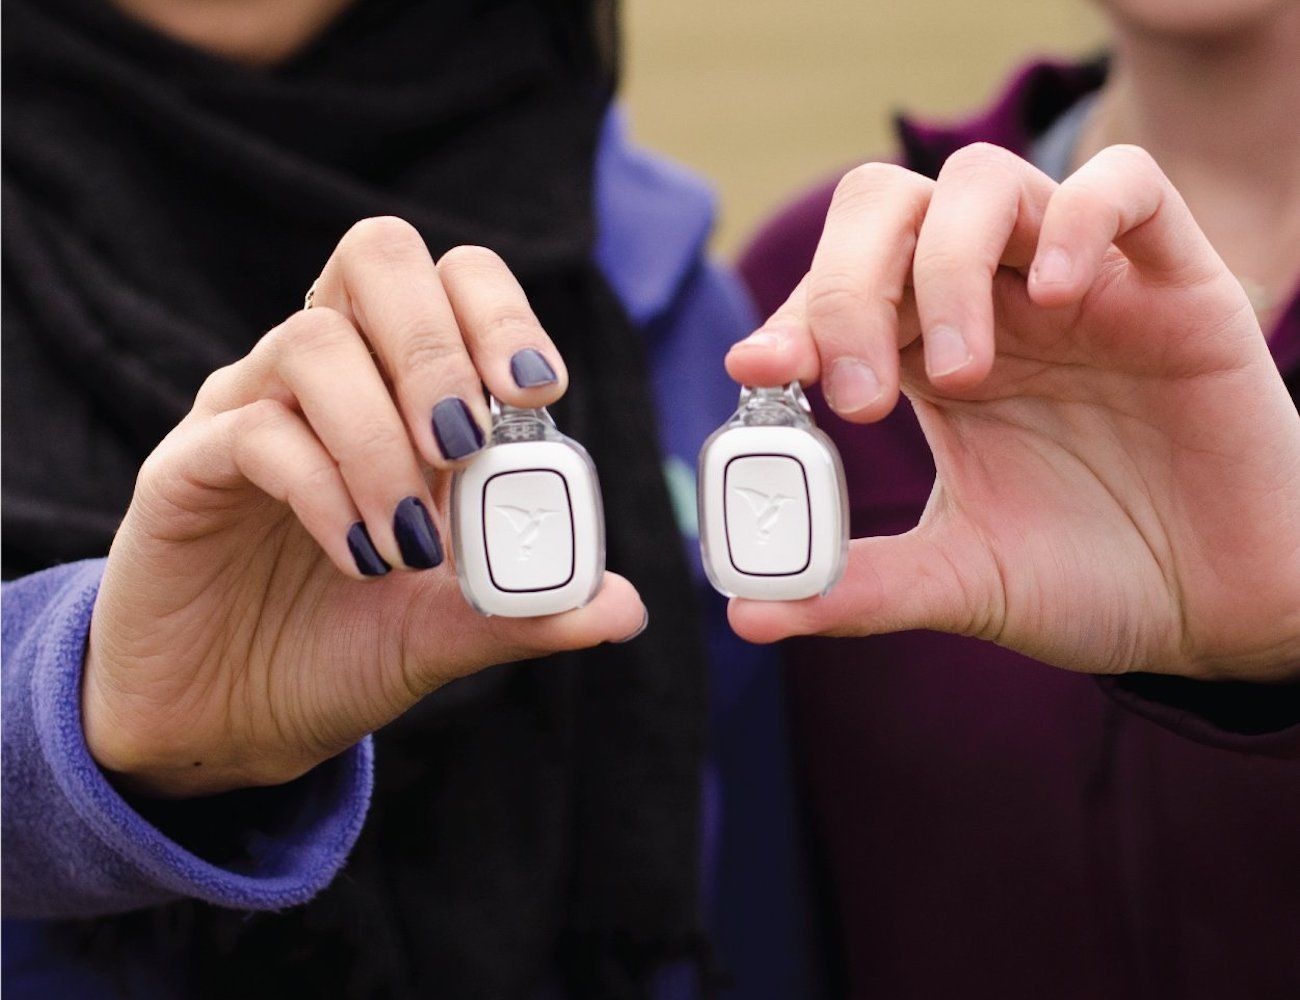 Revolar Instinct Personal Safety Device